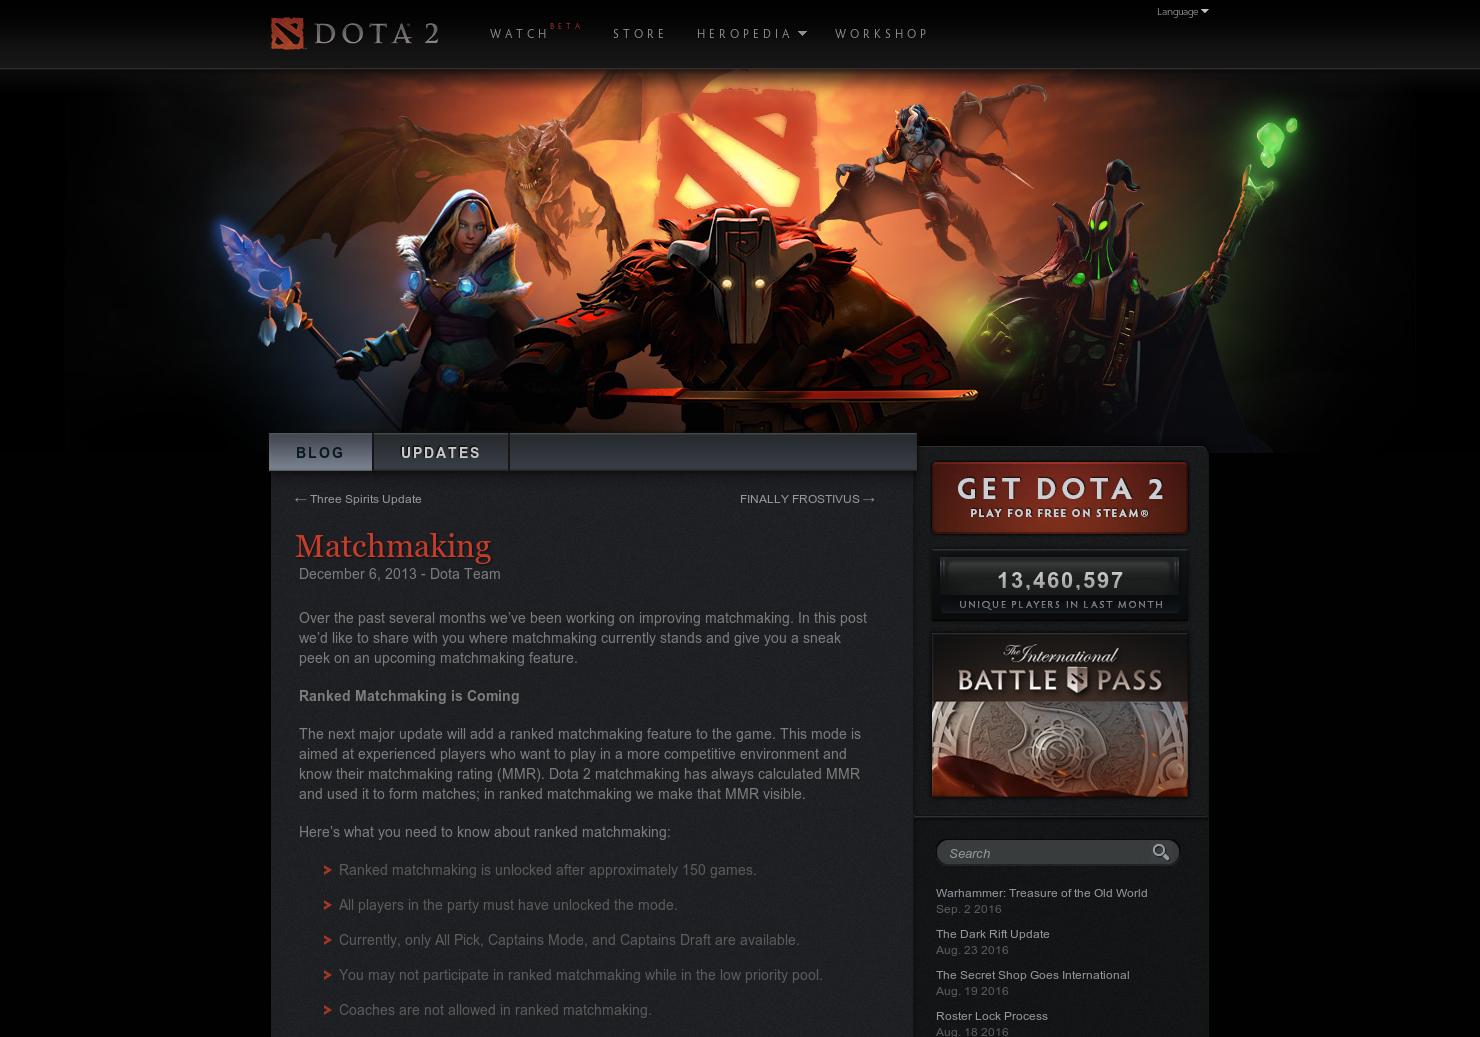 DotA 2 niveau de matchmaking